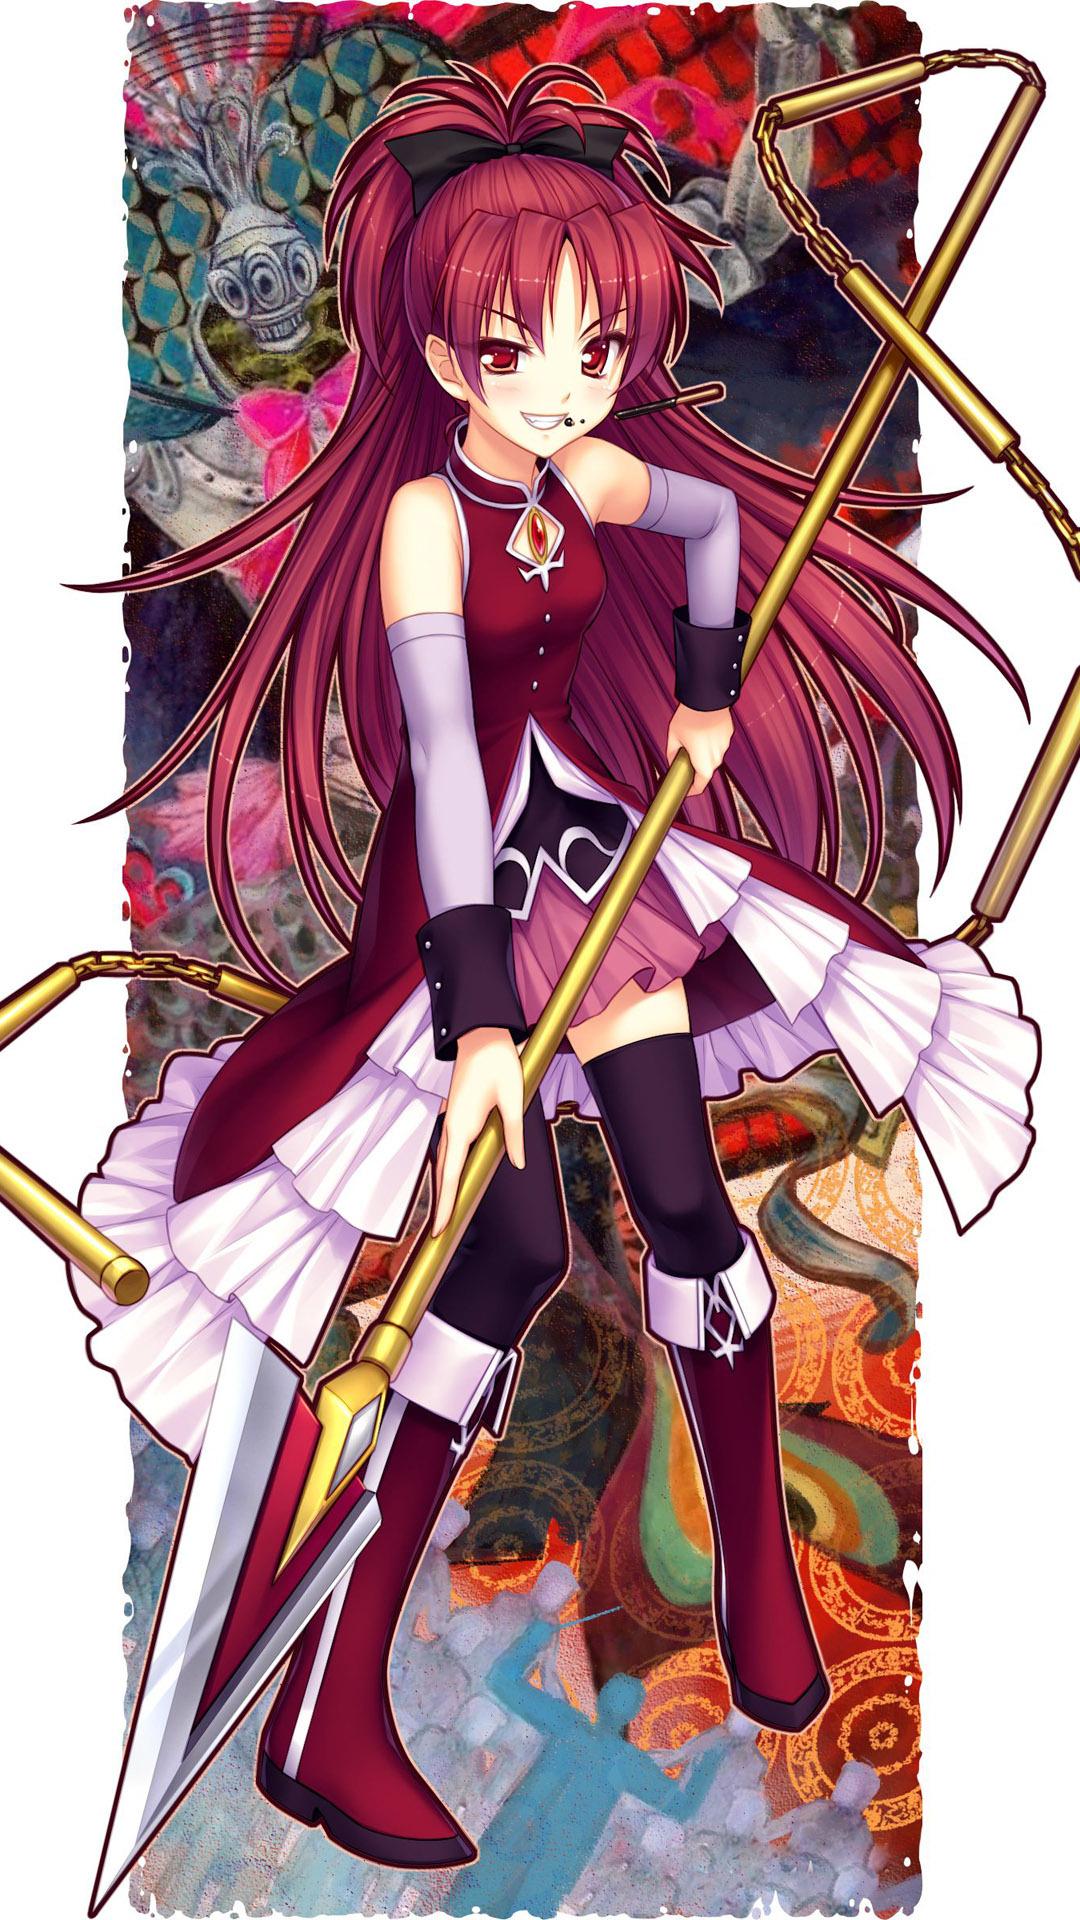 Kyoko-sakura-puella-magi-madoka-magica-anime-mobile ...